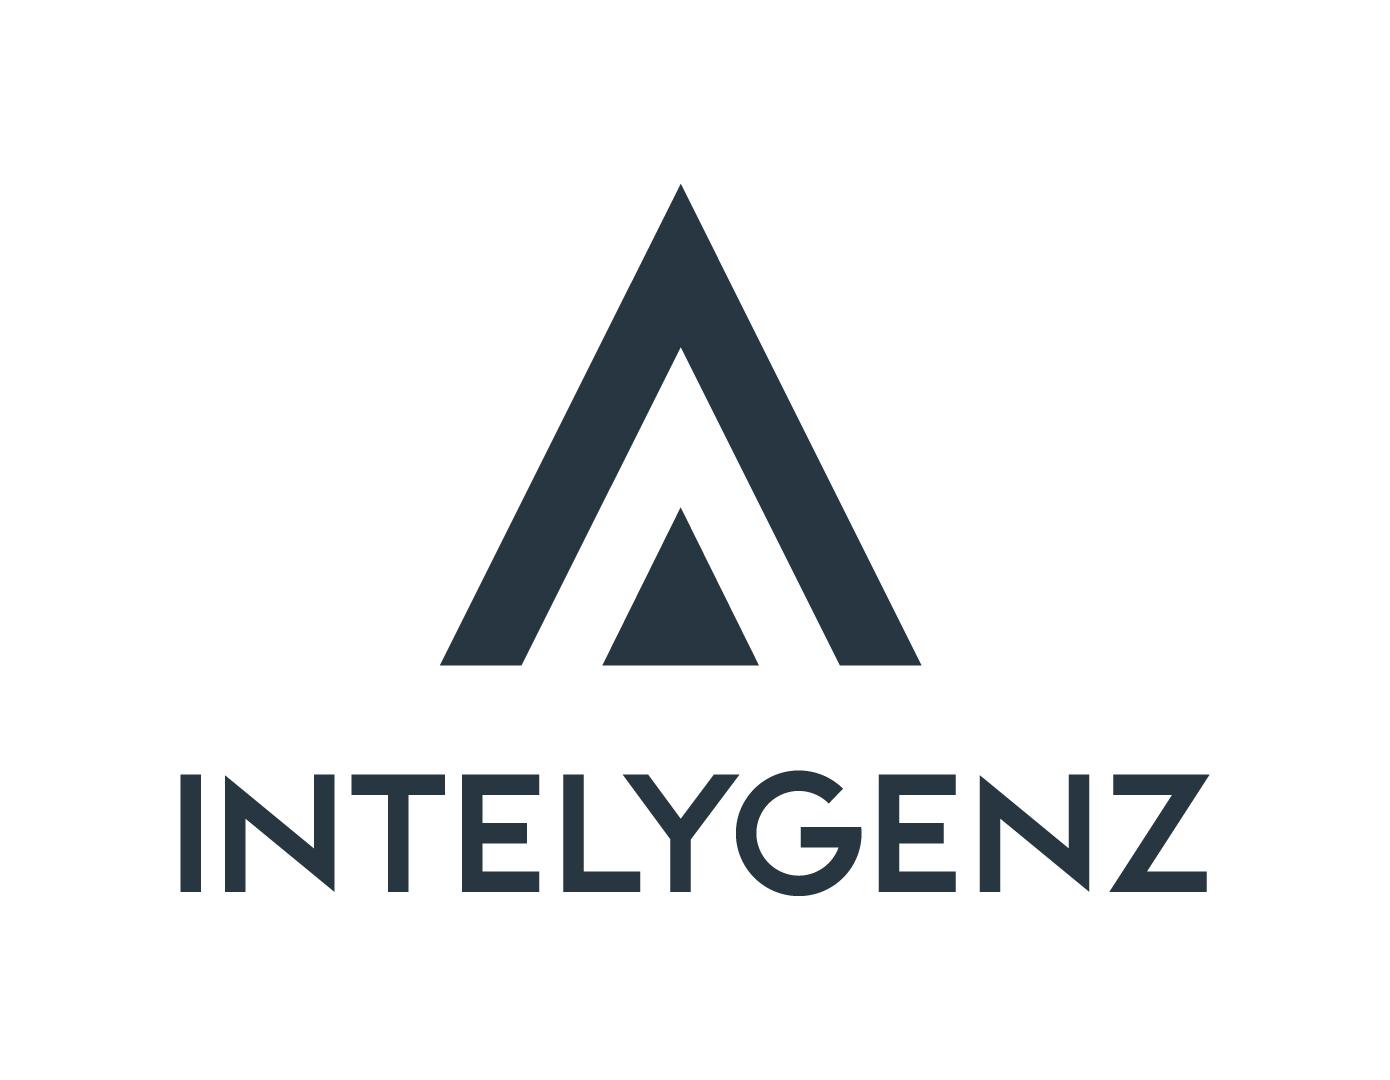 Intelygenz